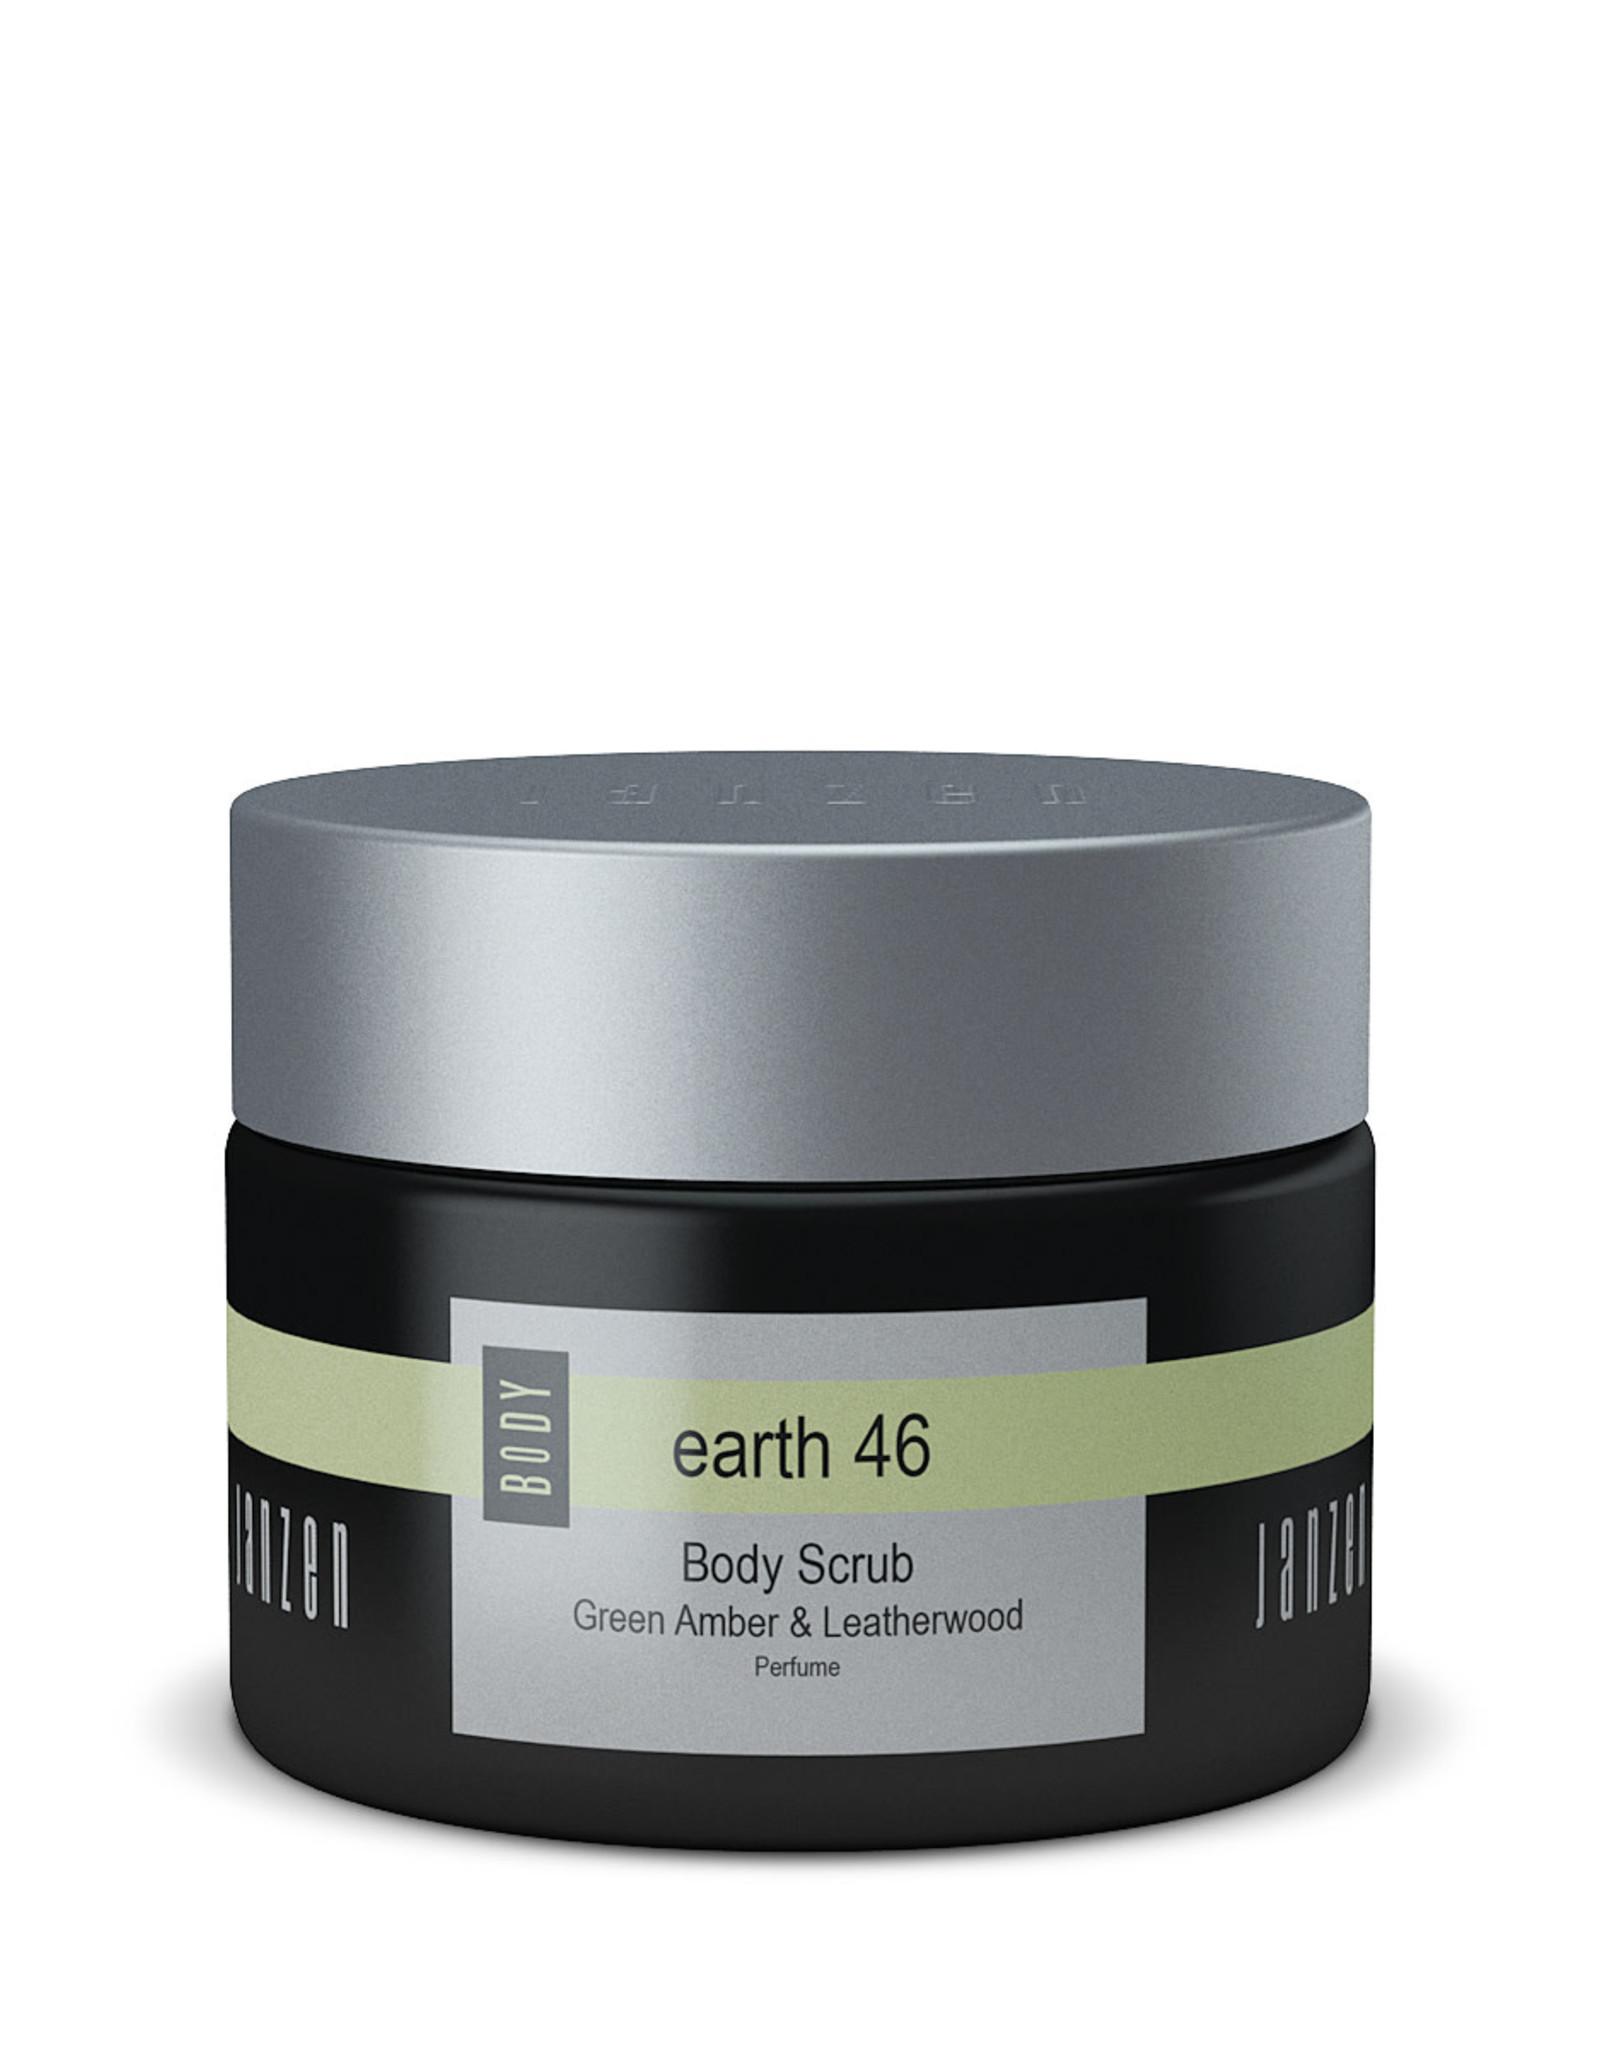 JANZEN Body Scrub Earth 46 300ml - JANZEN